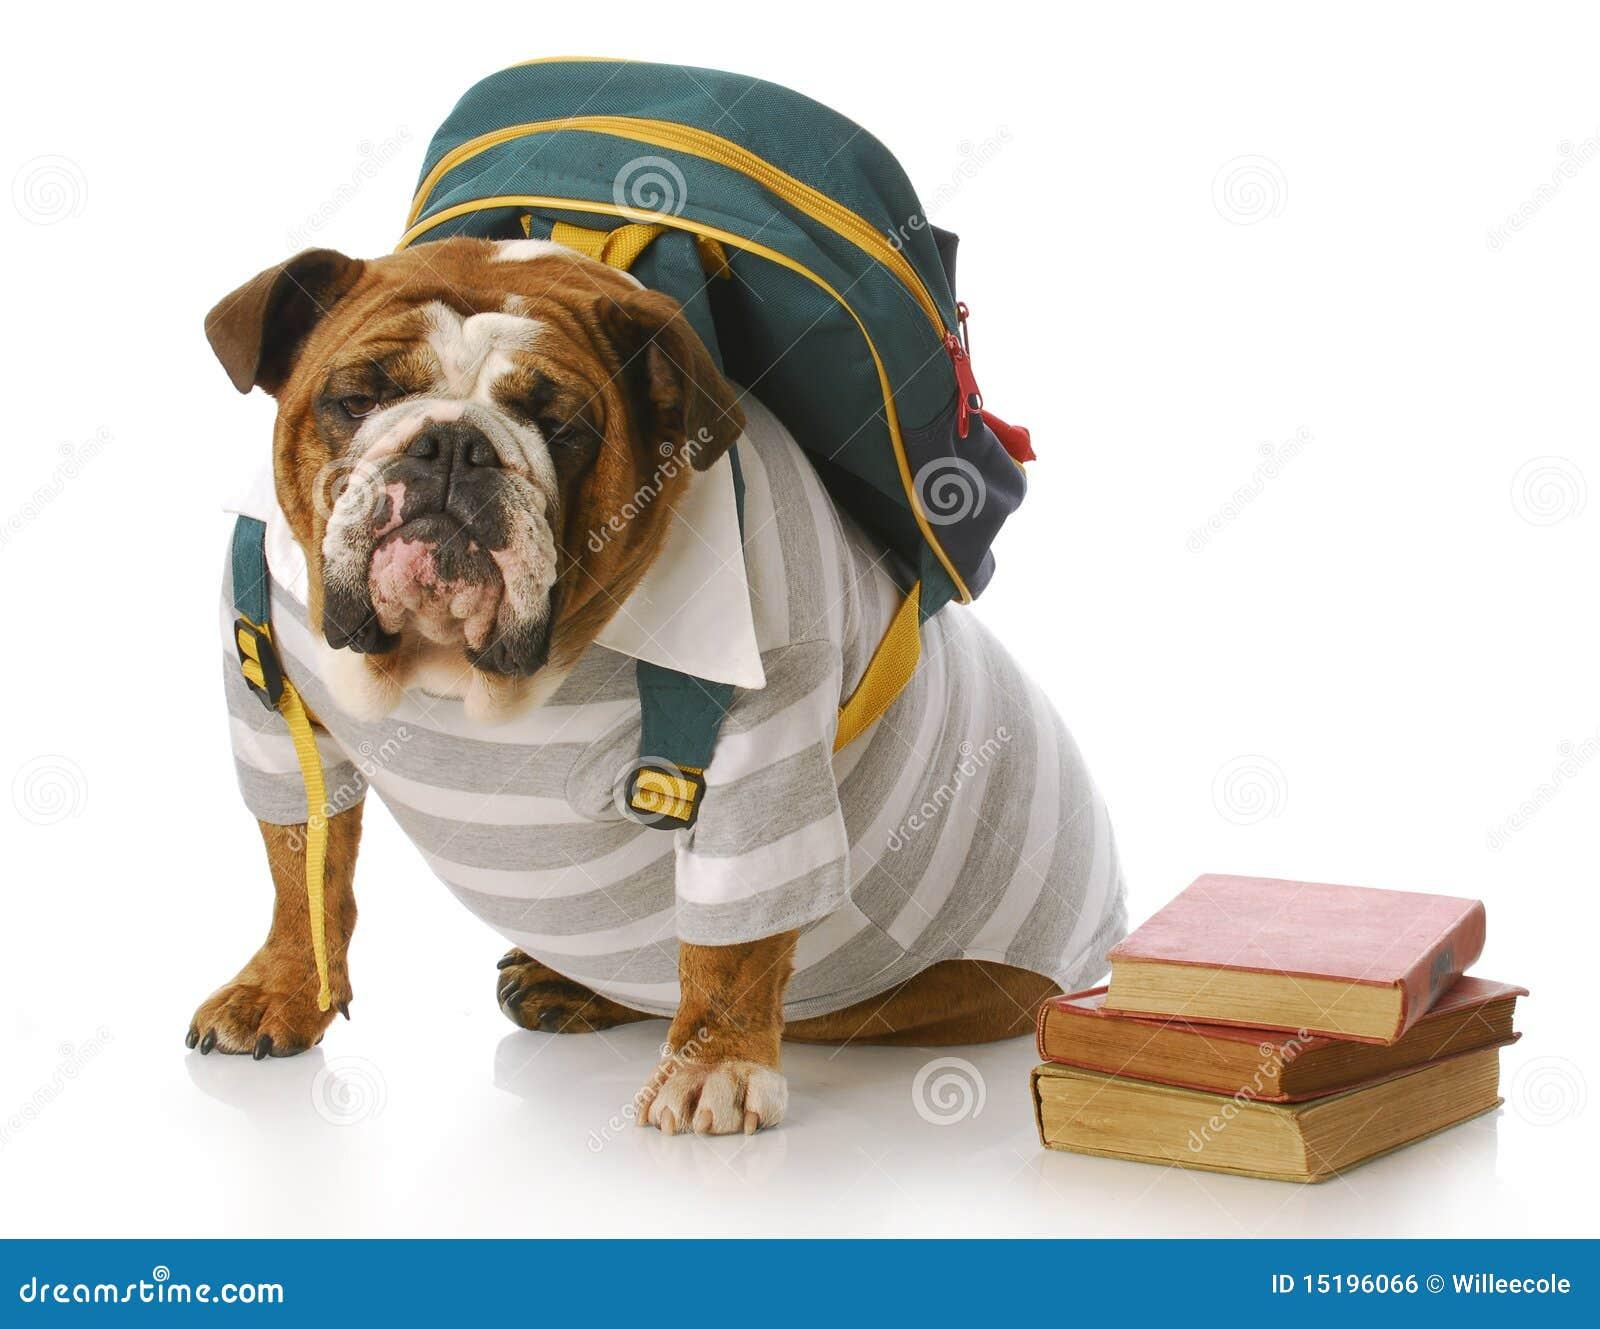 animal education royalty free stock image image 15196066 english bulldog clipart head english bulldog puppy clipart